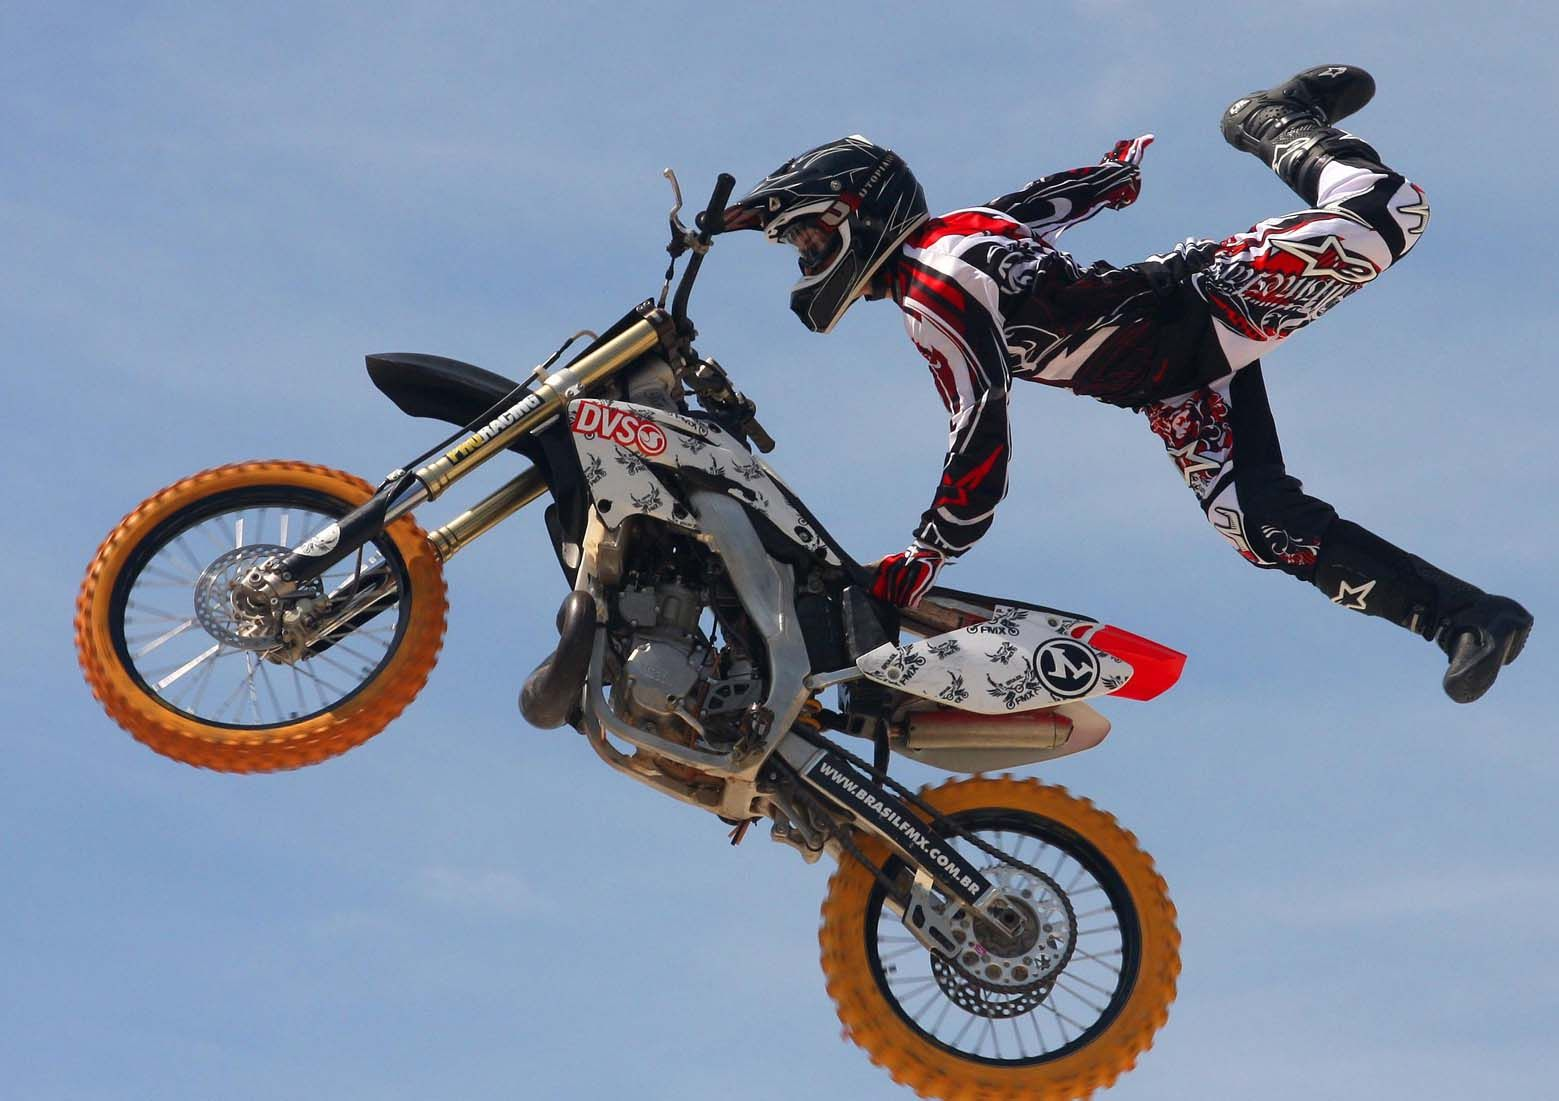 motor cross | Manobras de MotoCross - Freestyle - Estilo Livre e ...